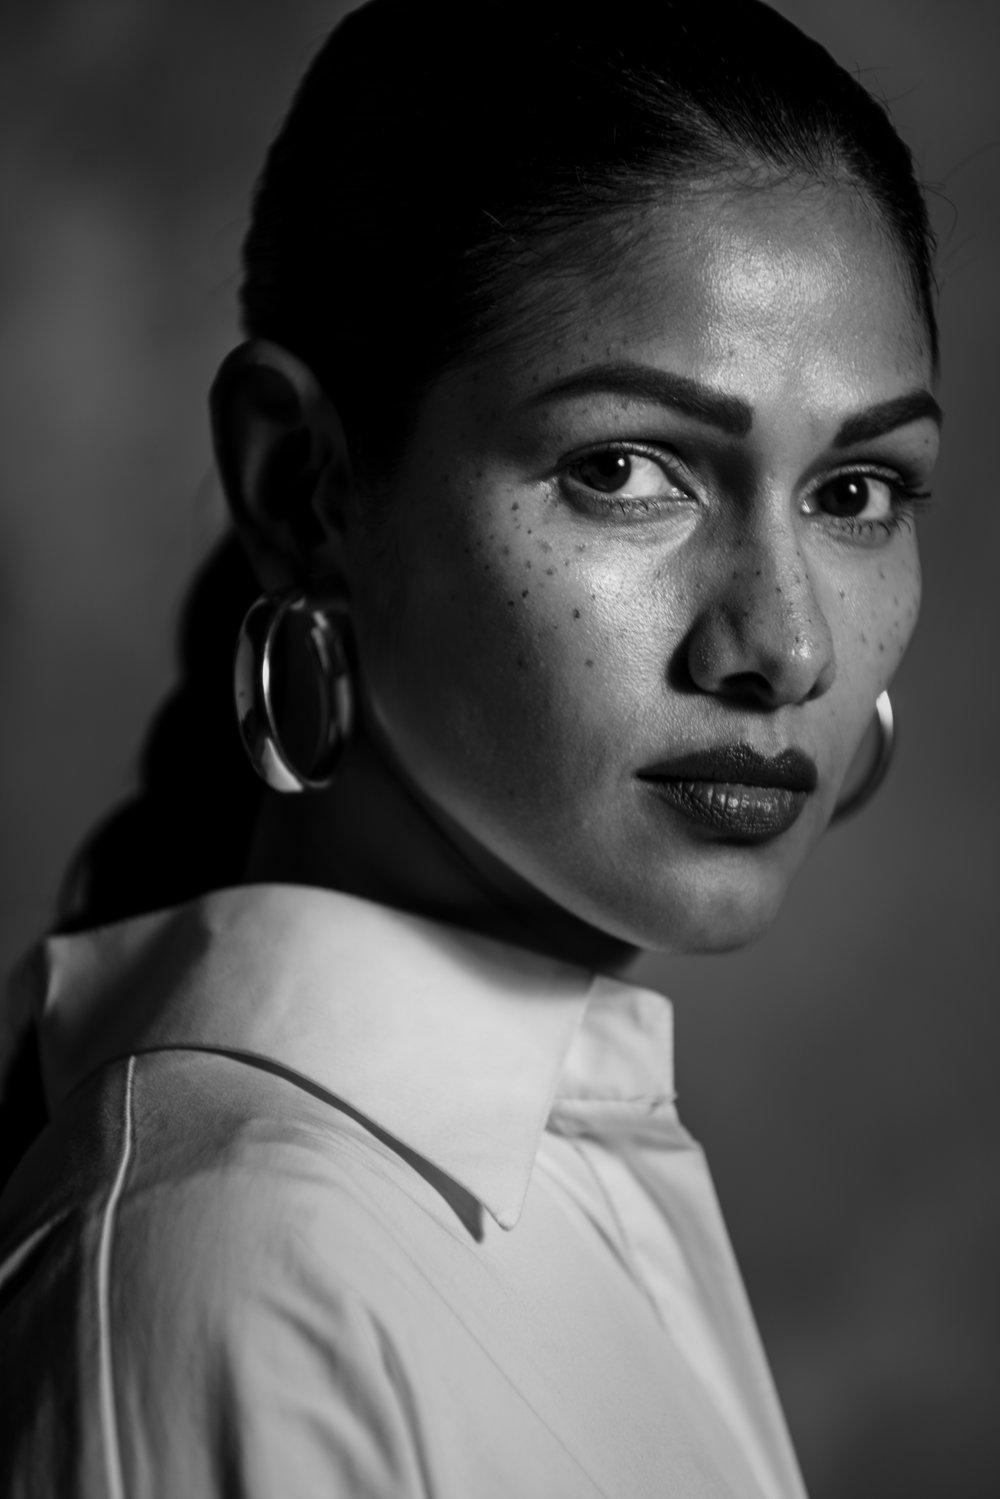 Concept and Styling by Shirin Salwan.  Photographed by Rafique Sayed.  Hair by Akshata Nandan Honawar.  Makeup by Alisha Bhambani Agarwal.